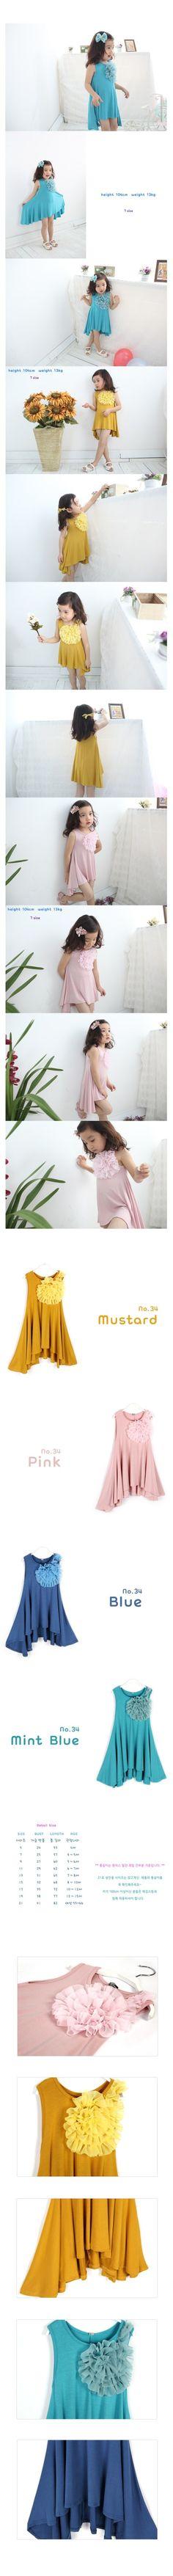 10 Best Baju Anak Images Islam Muslim Child Chocker Slice Top Blouse Atasan Wanita Bl899 Beautiful Sleeveless Big Flower Irregular Skirt Princess Dress